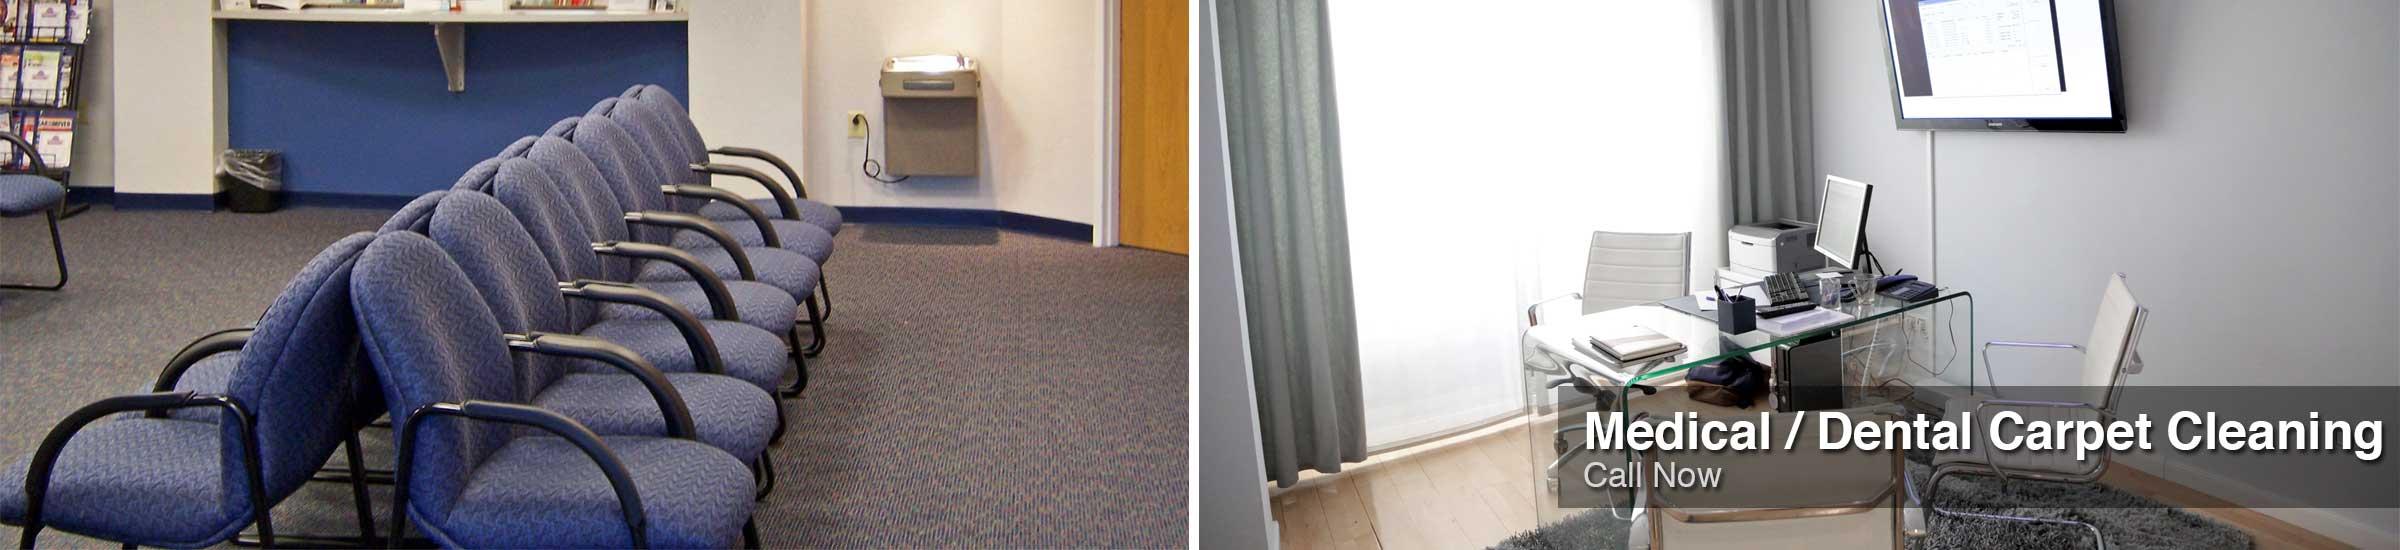 Pro Steam Carpet Care Carpet Cleaning Lagrange Ga Carpet